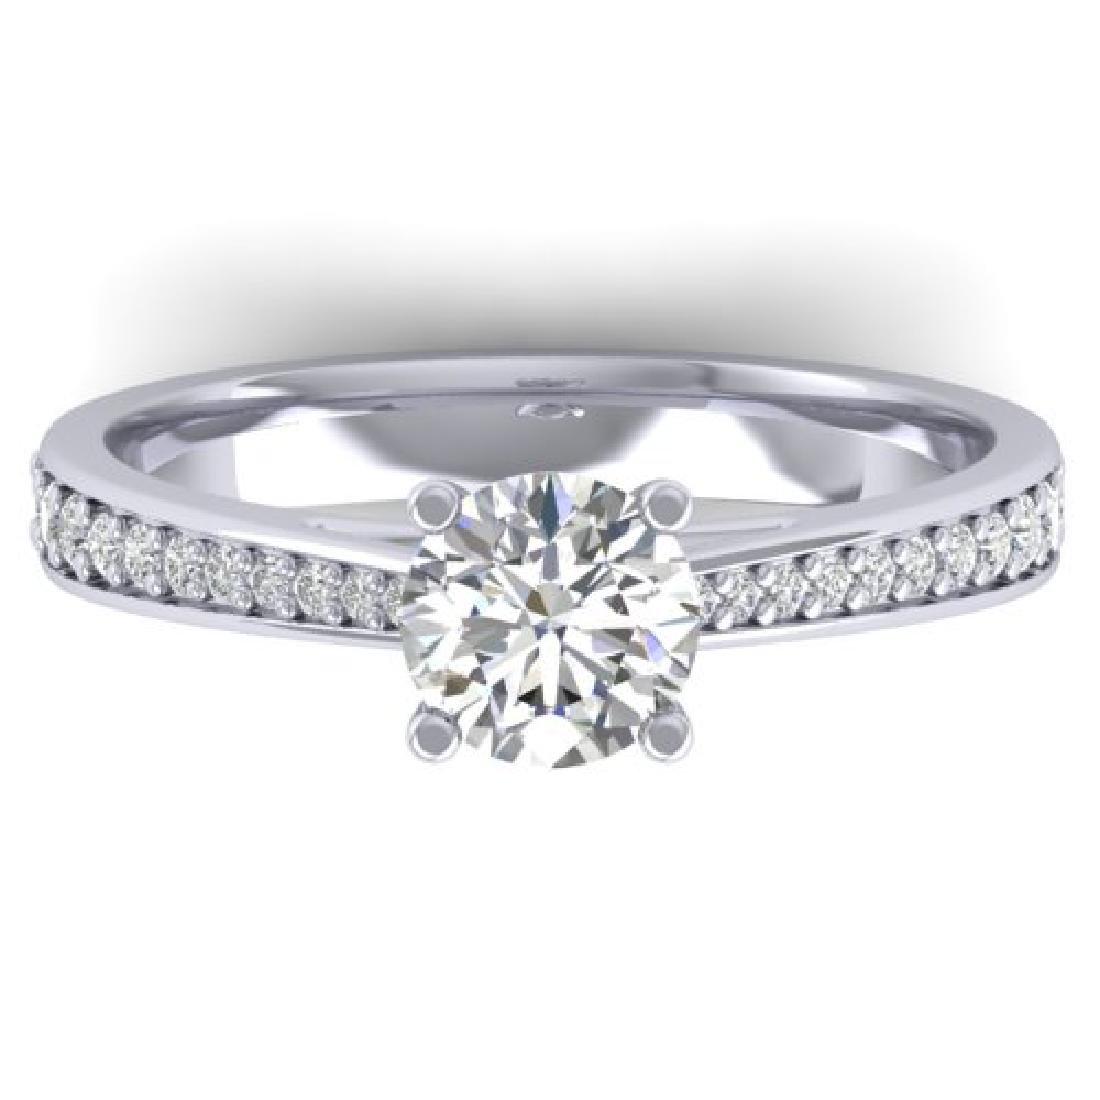 1.01 CTW Certified VS/SI Diamond Solitaire Art Deco